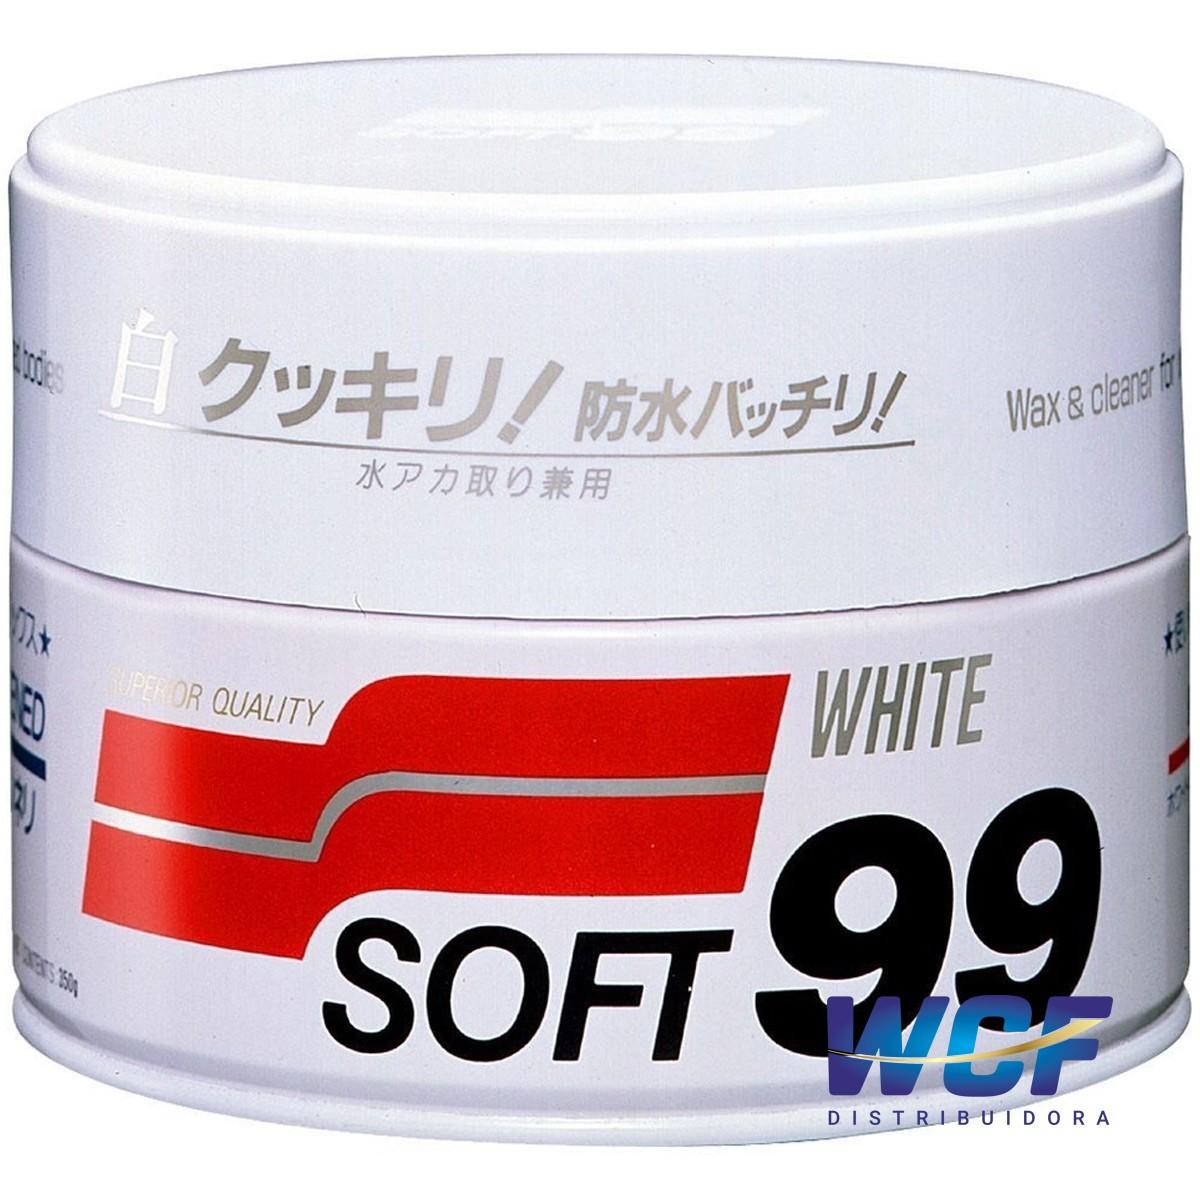 SOFT99 CERA WHITE WAX 300G